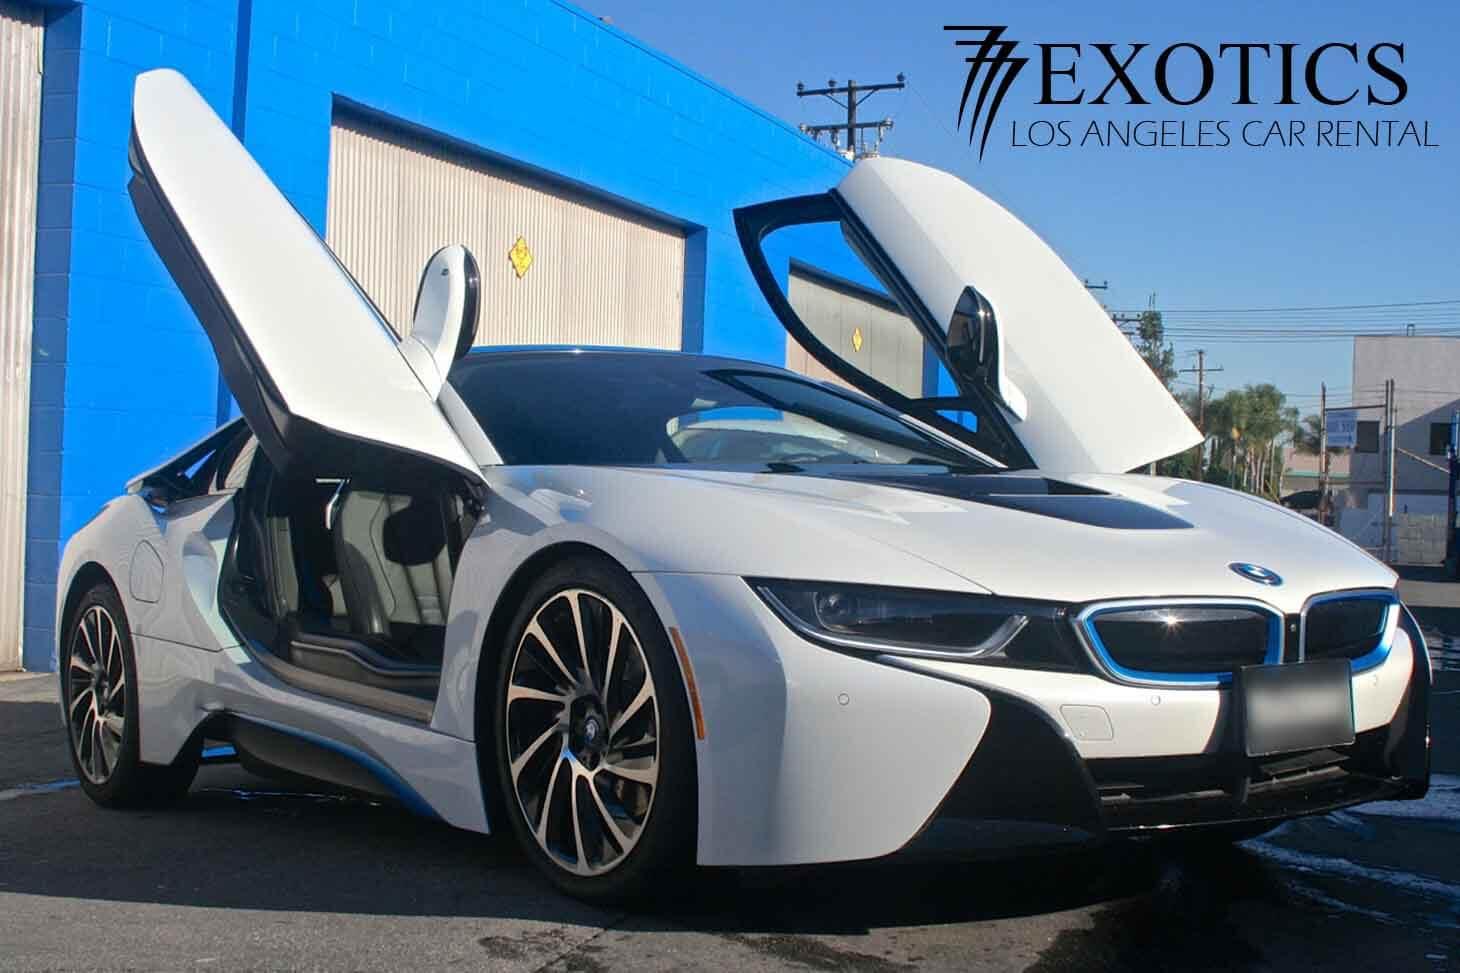 rental vegas car cars cropped exotic dream drive your las ferrari nv